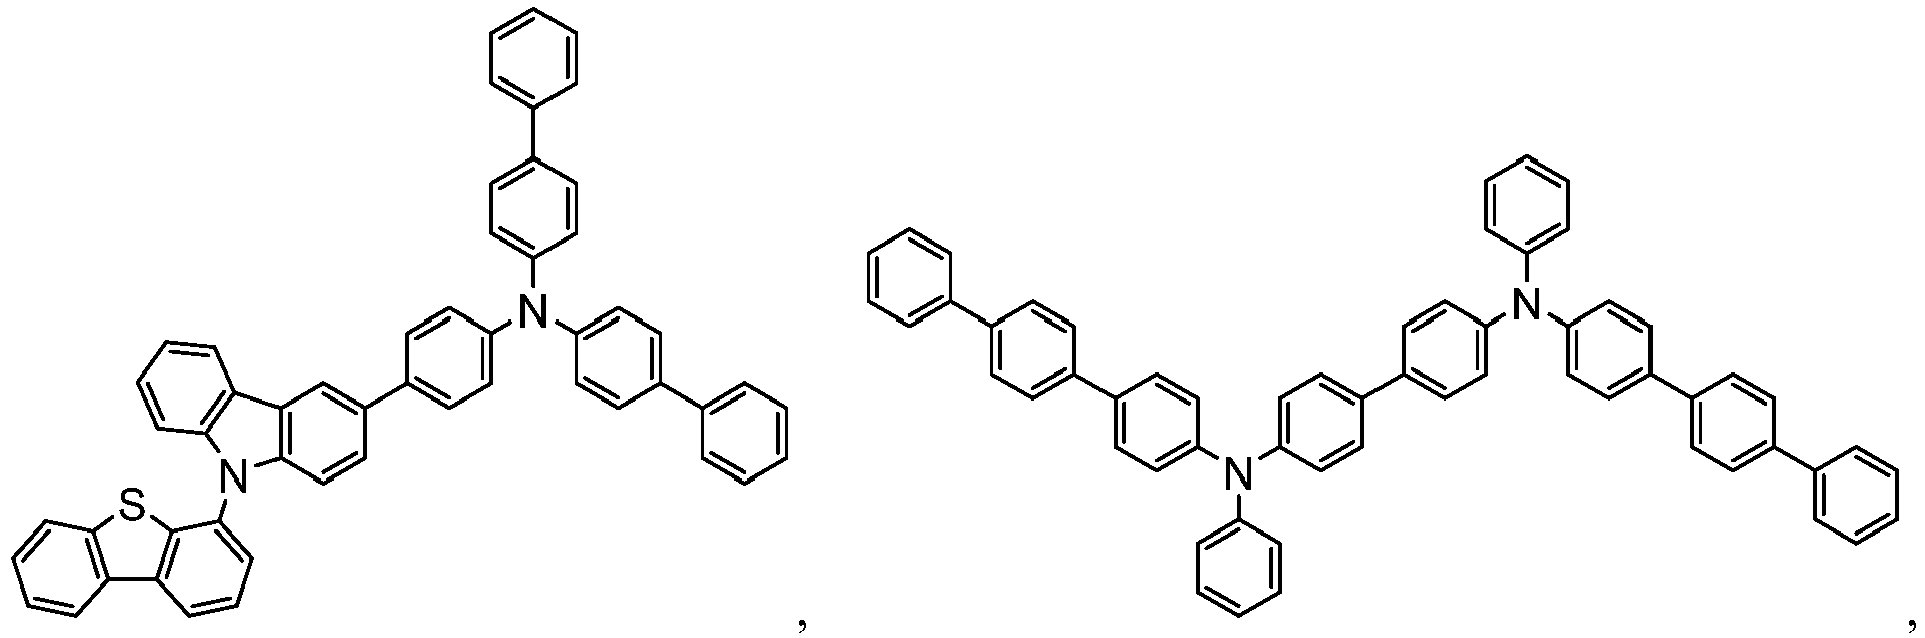 Figure imgb0854